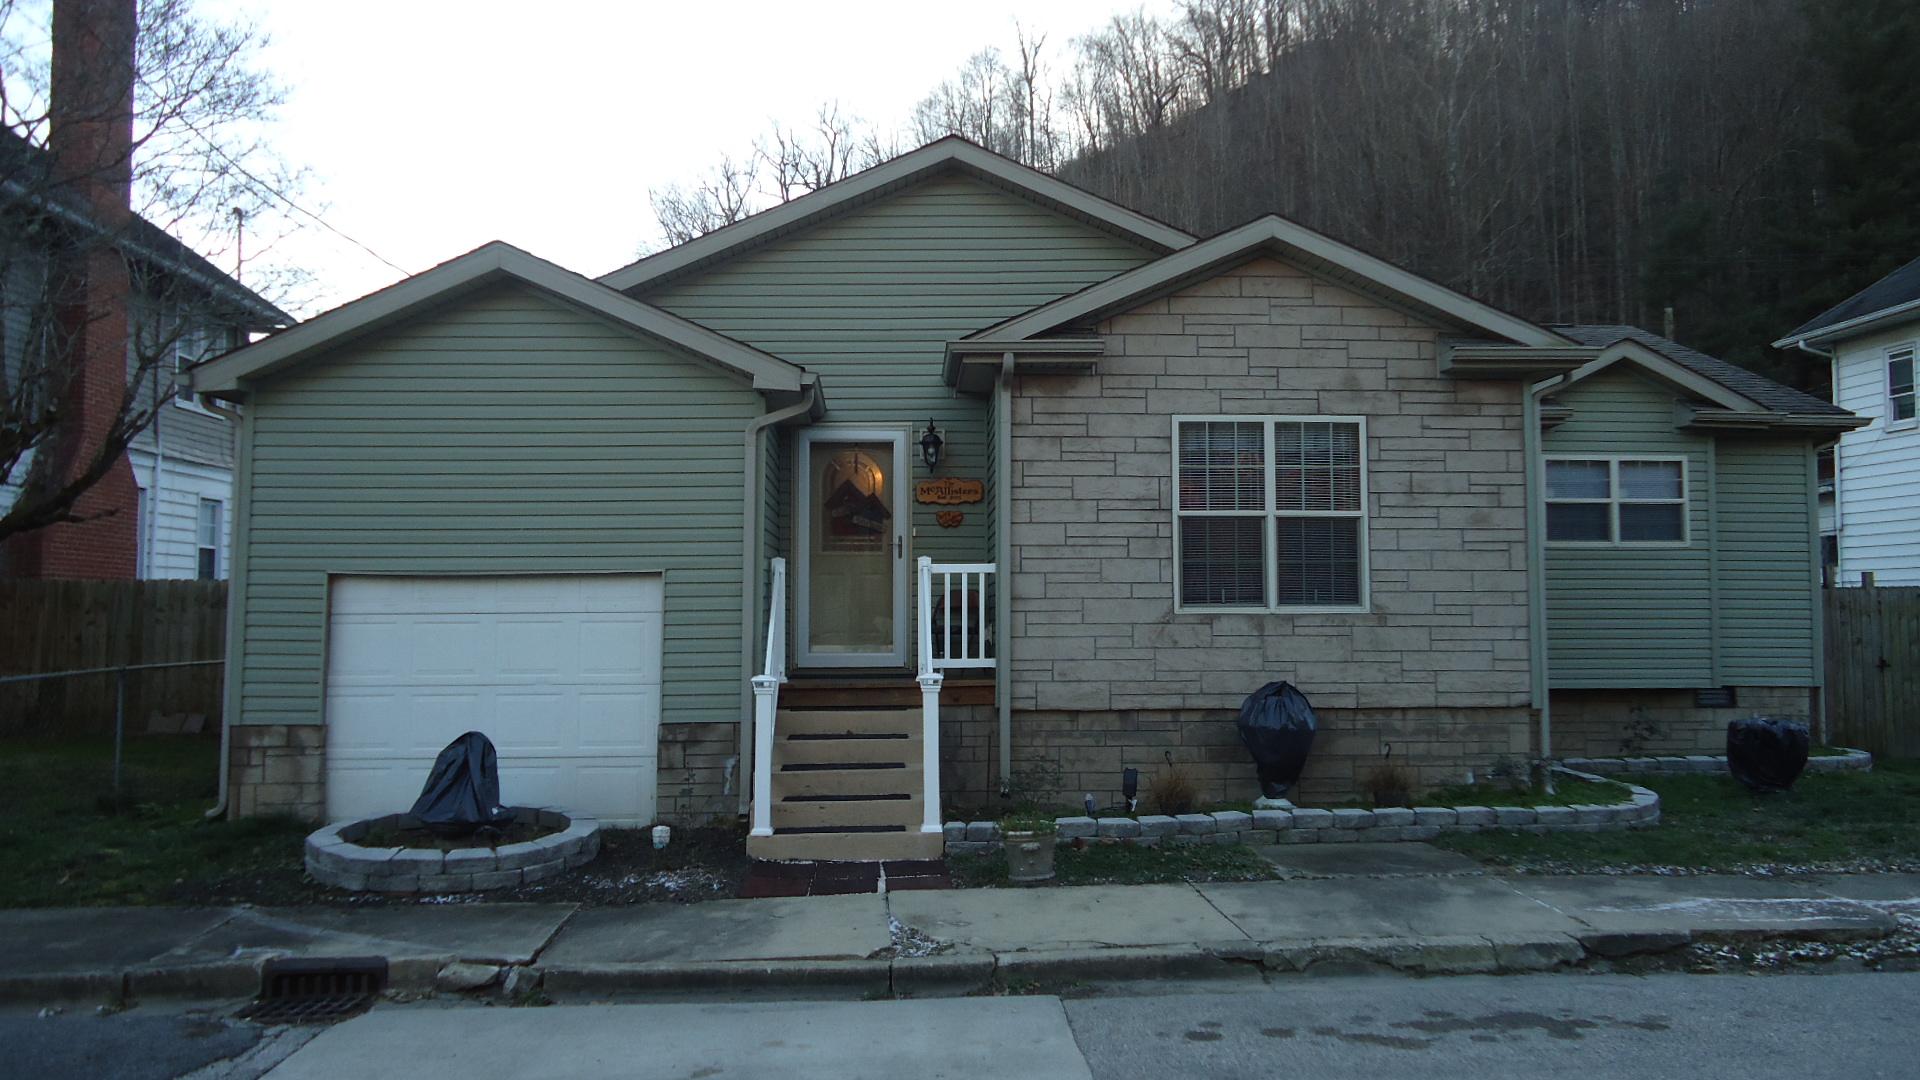 702 Coolidge St., Holden, West Virginia 25625